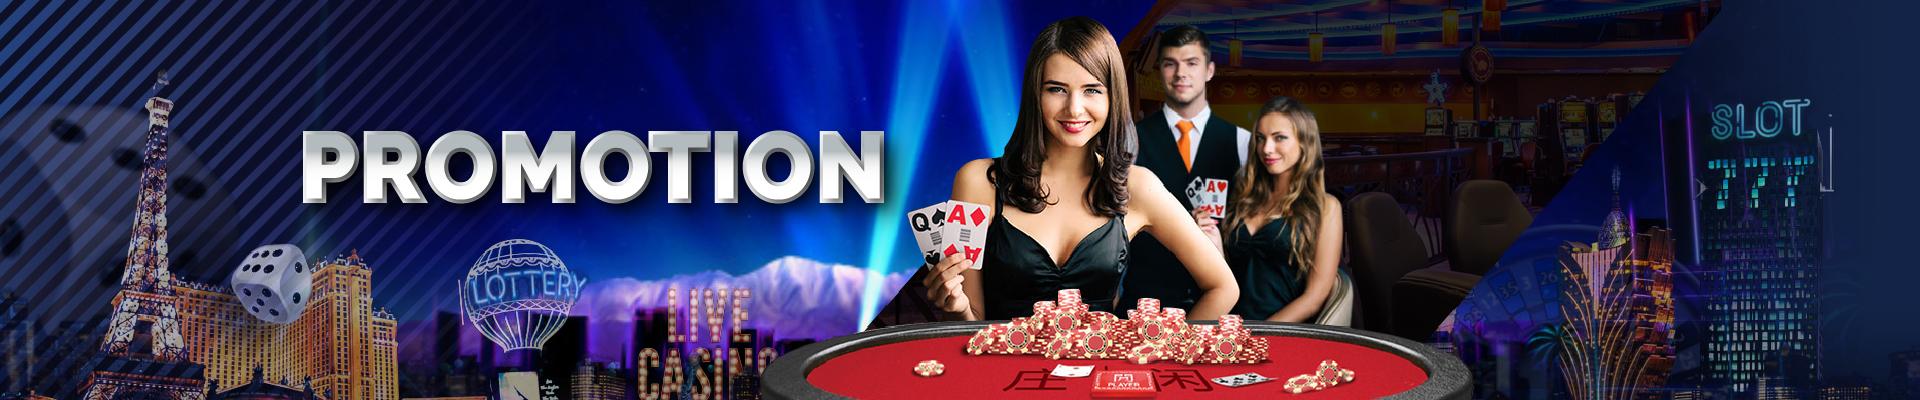 UWIN33 Online Casino Malaysia Promotion Banner